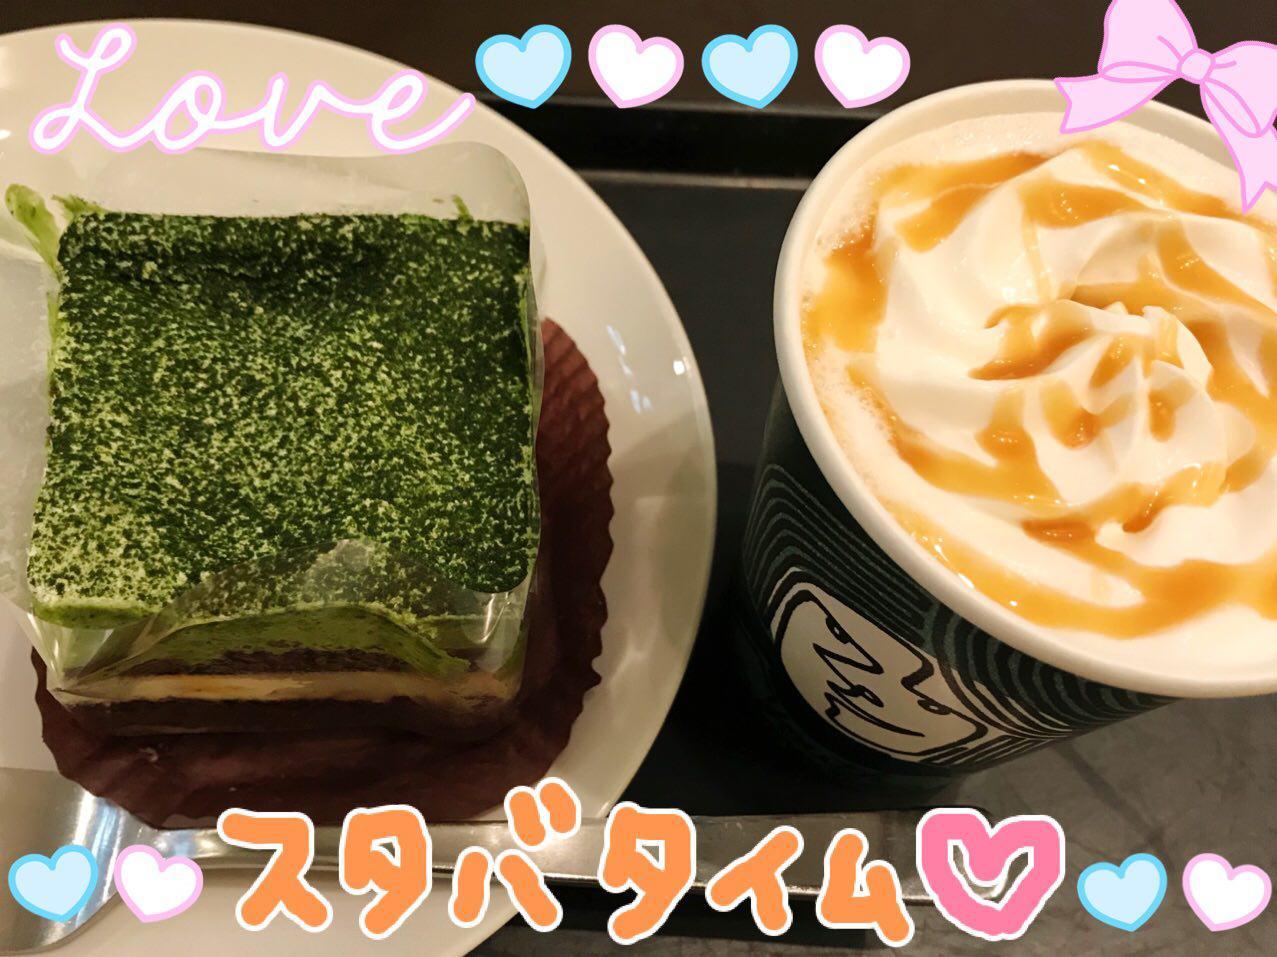 photo_2018-03-08_22-09-15.jpg